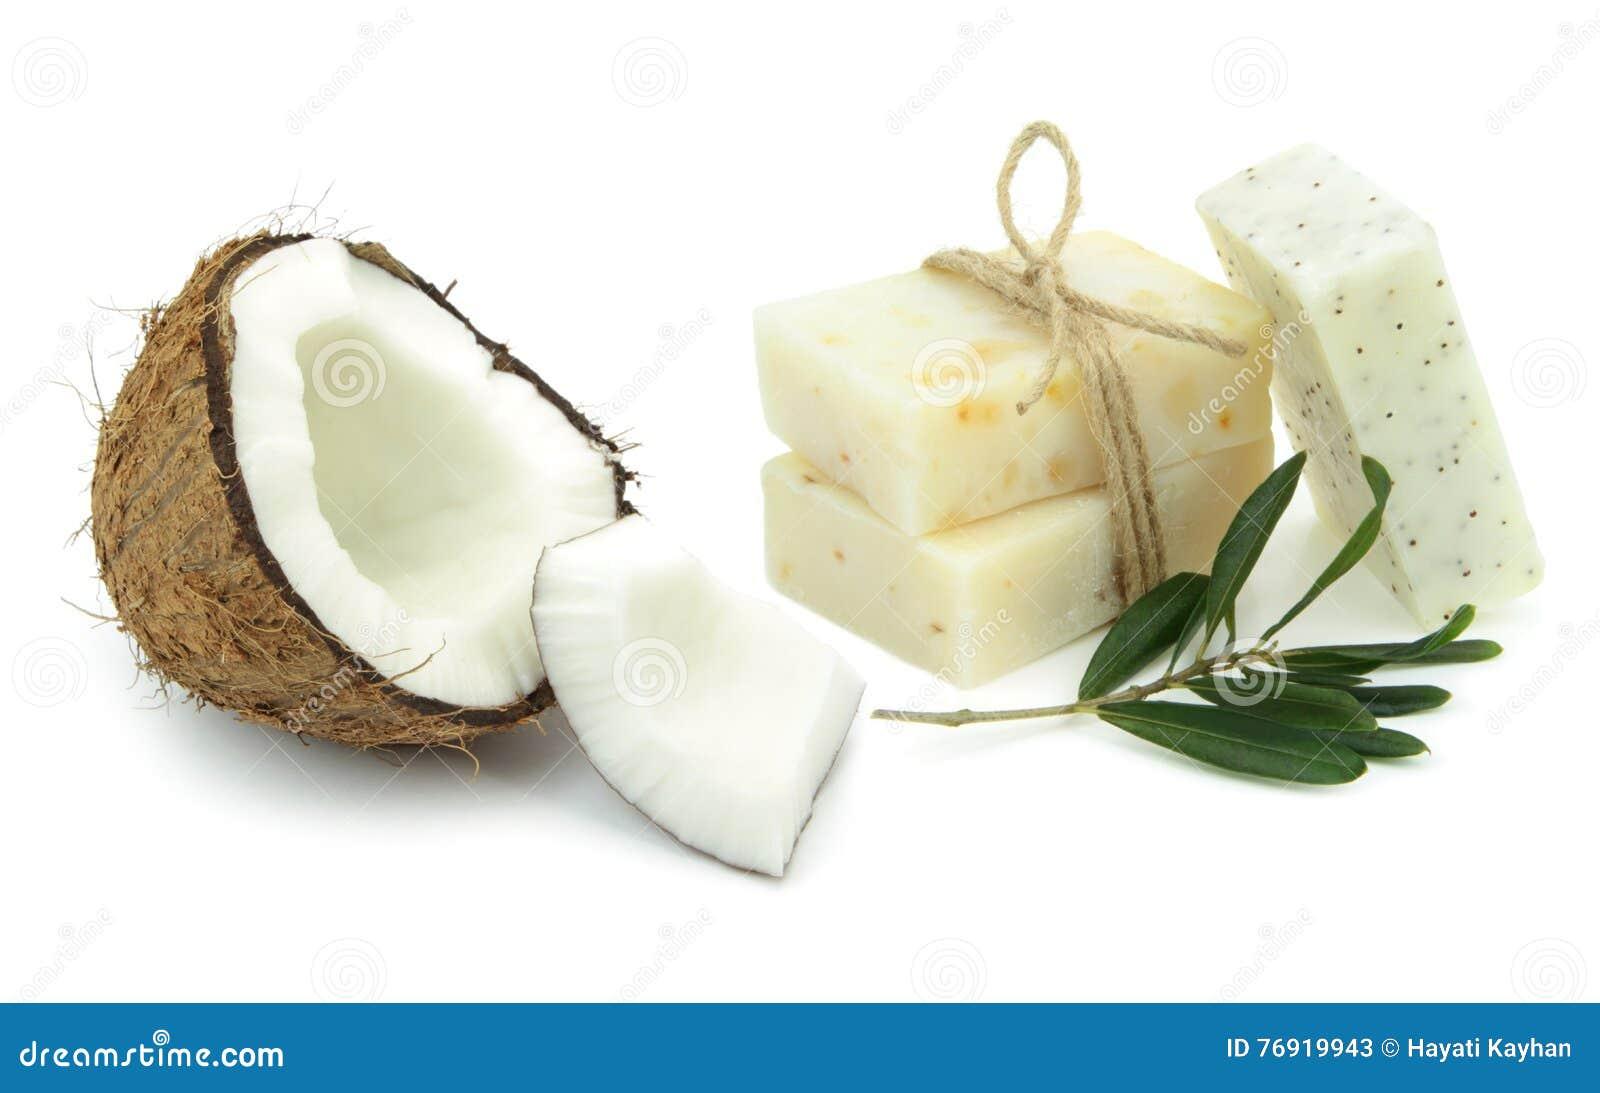 Natürliche Kräuterseifen mit Olive und Kokosnussöl